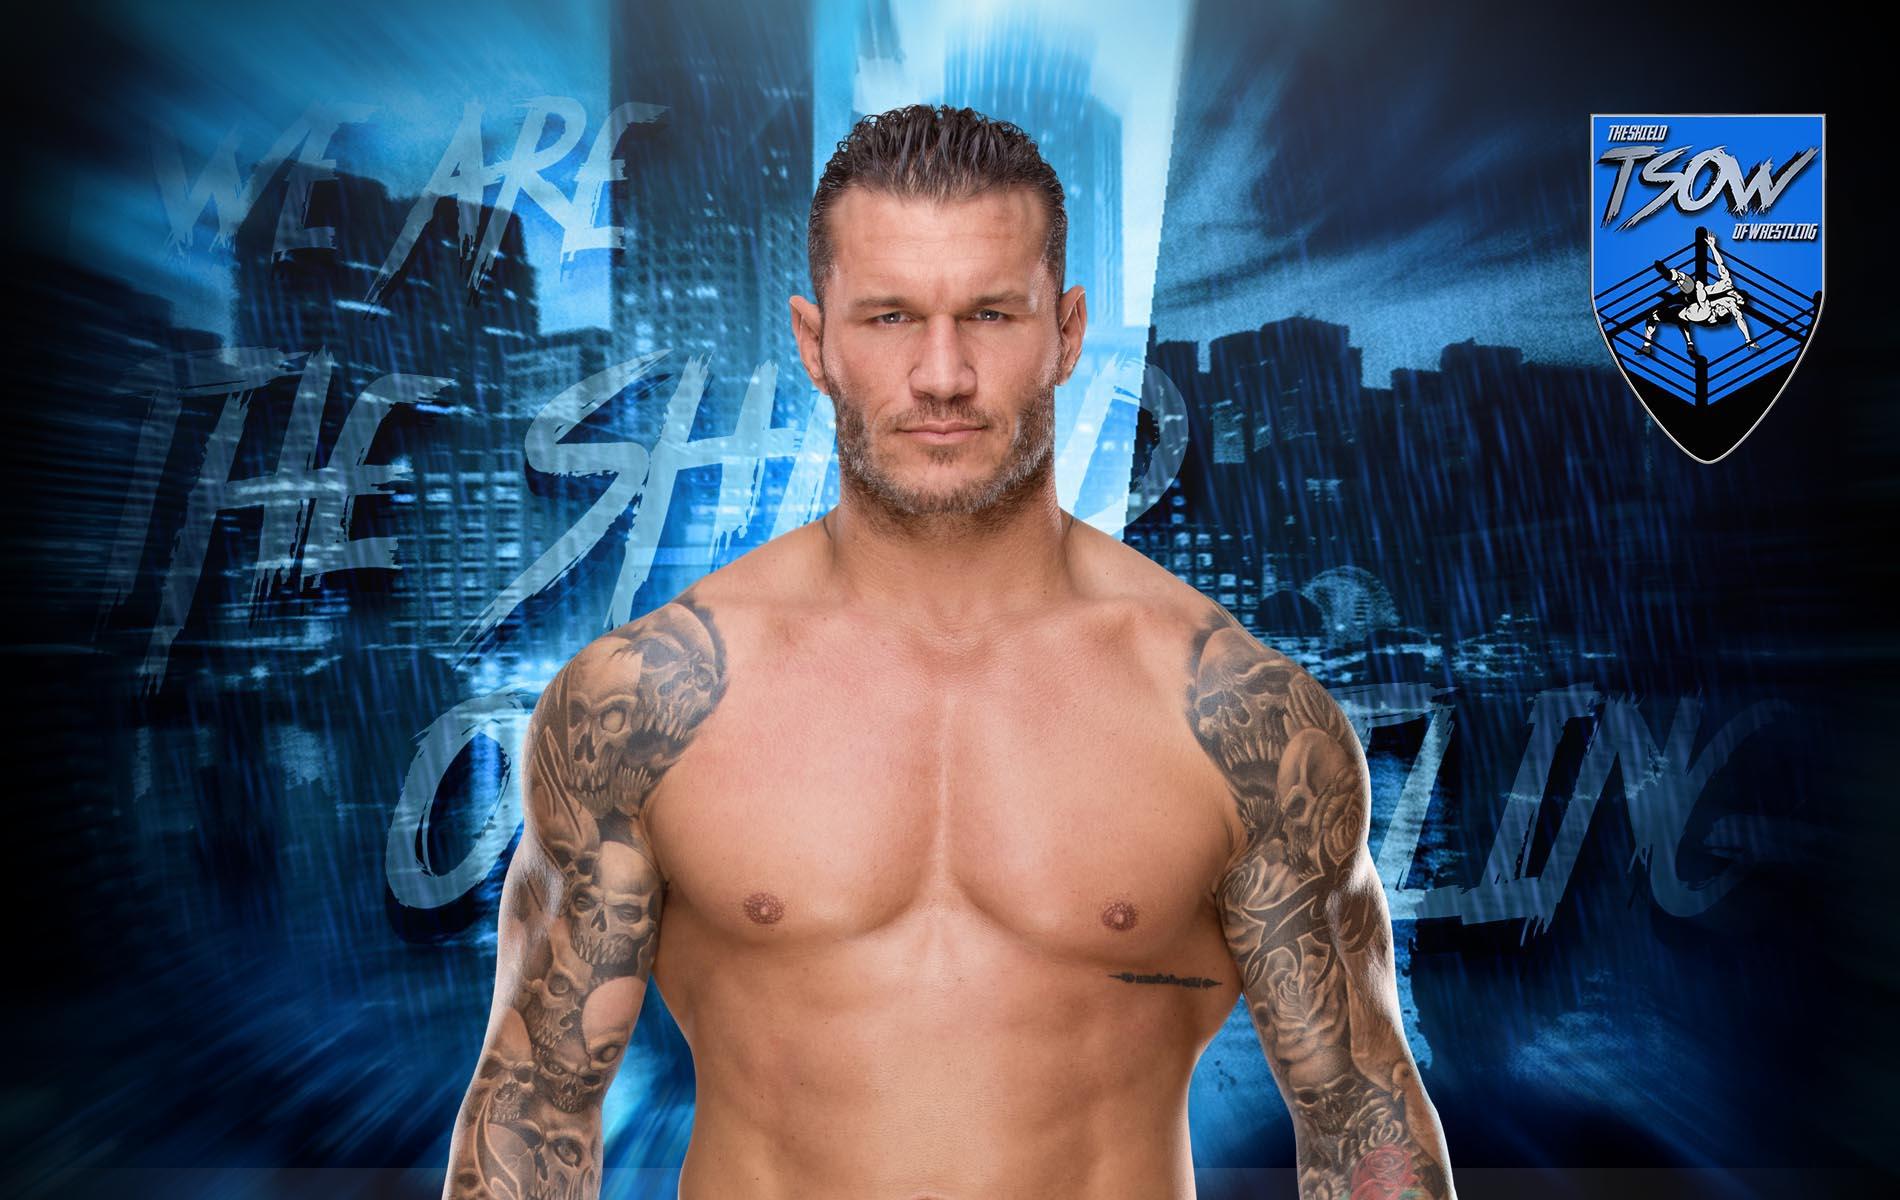 Randy Orton fumò marijuana a WrestleMania 24